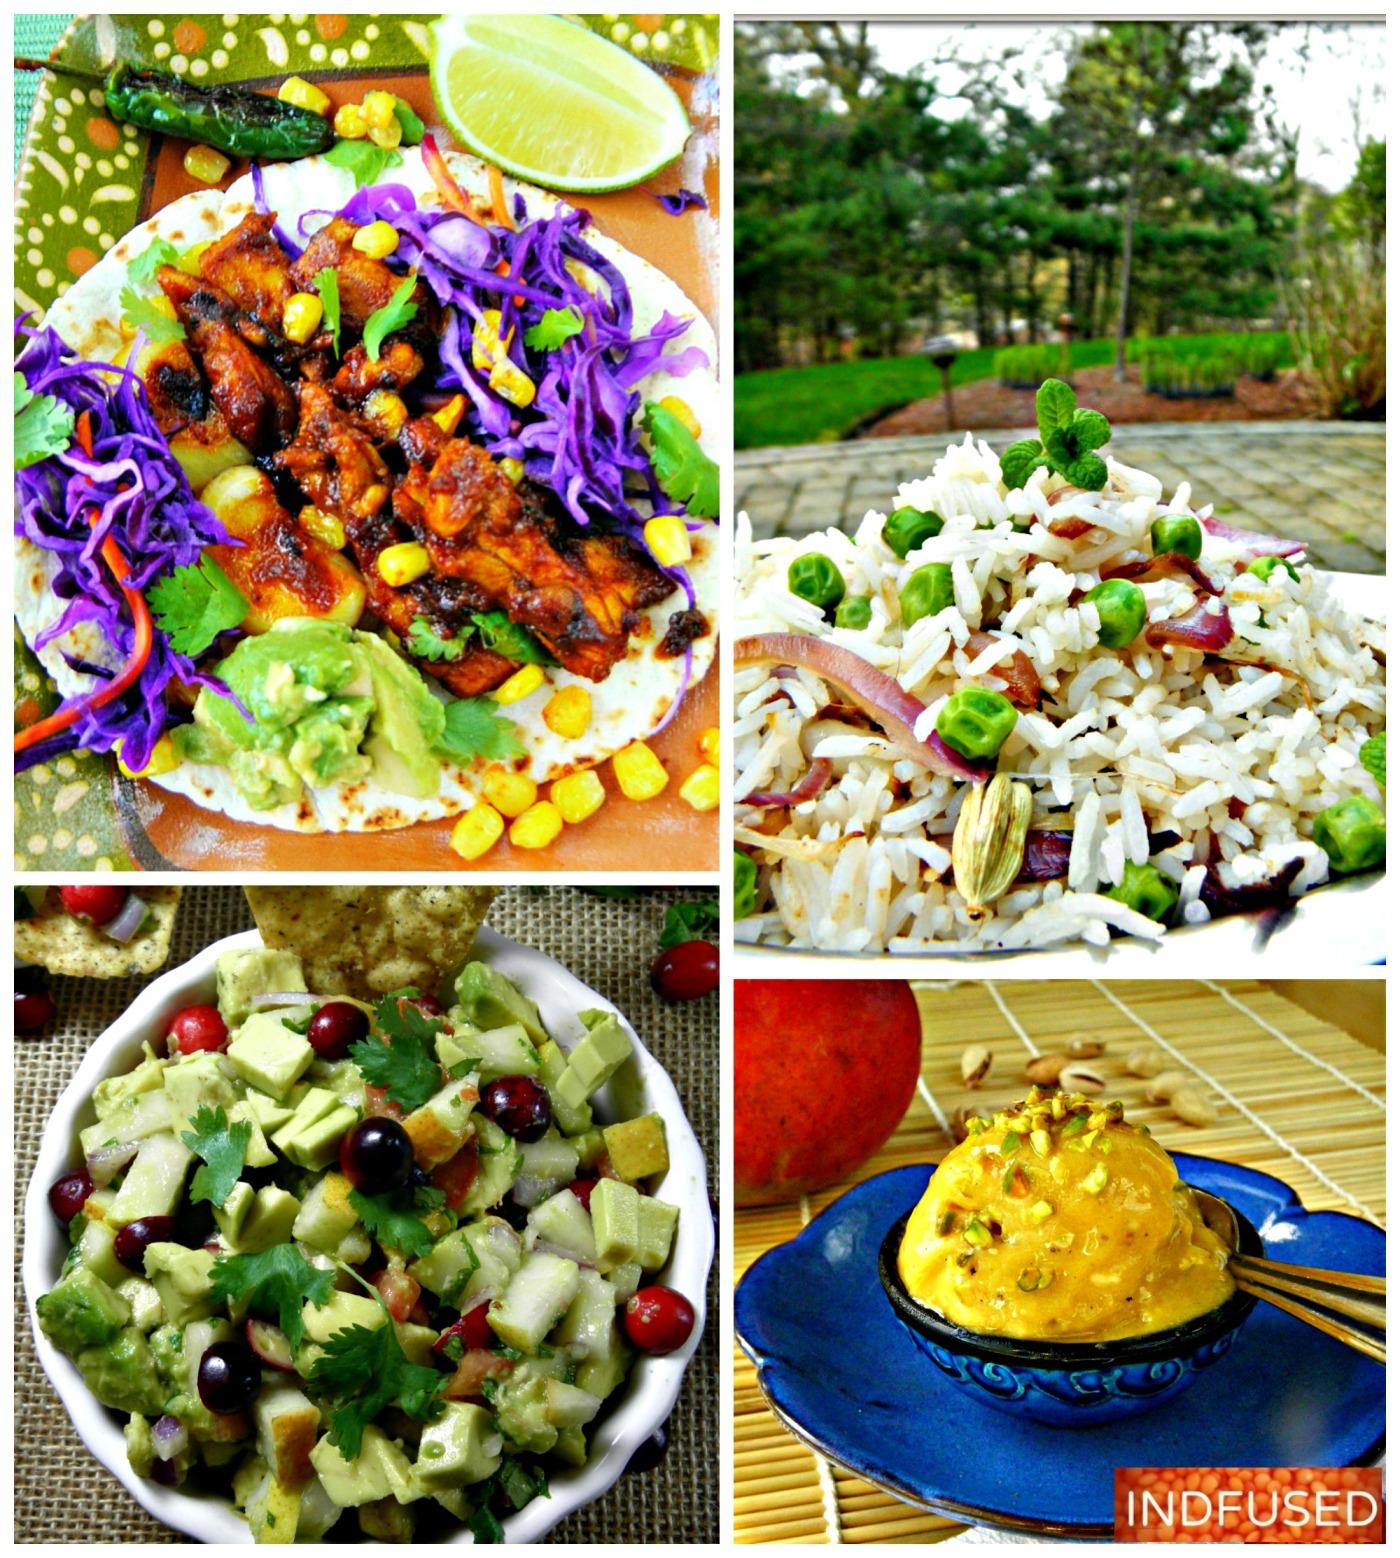 Easy #Spring dinners, #Indomexican cuisine, #veganicecream #avocadorelish #costcoavocados #glutenfreeicecream